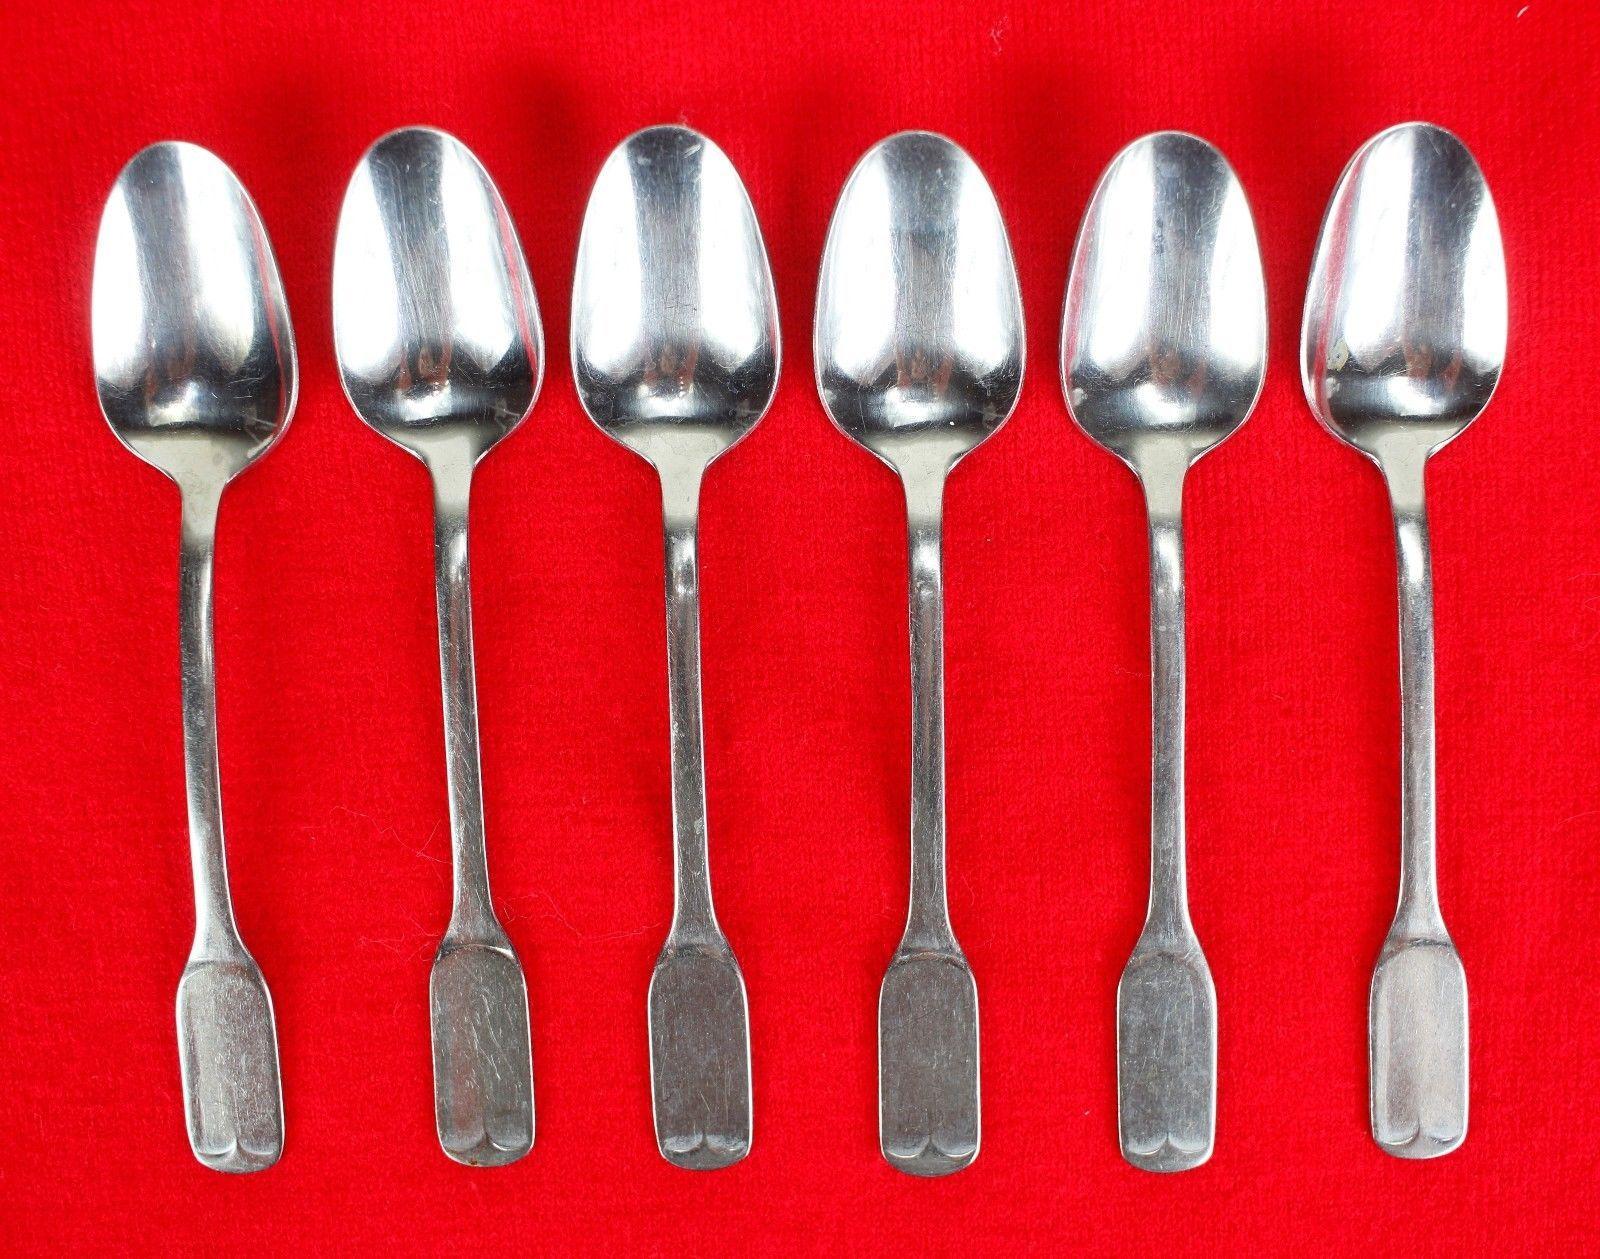 "6X Teaspoons Spoons FB Rogers Stainless Flat Square End Flatware 6"" Tea Spoon"